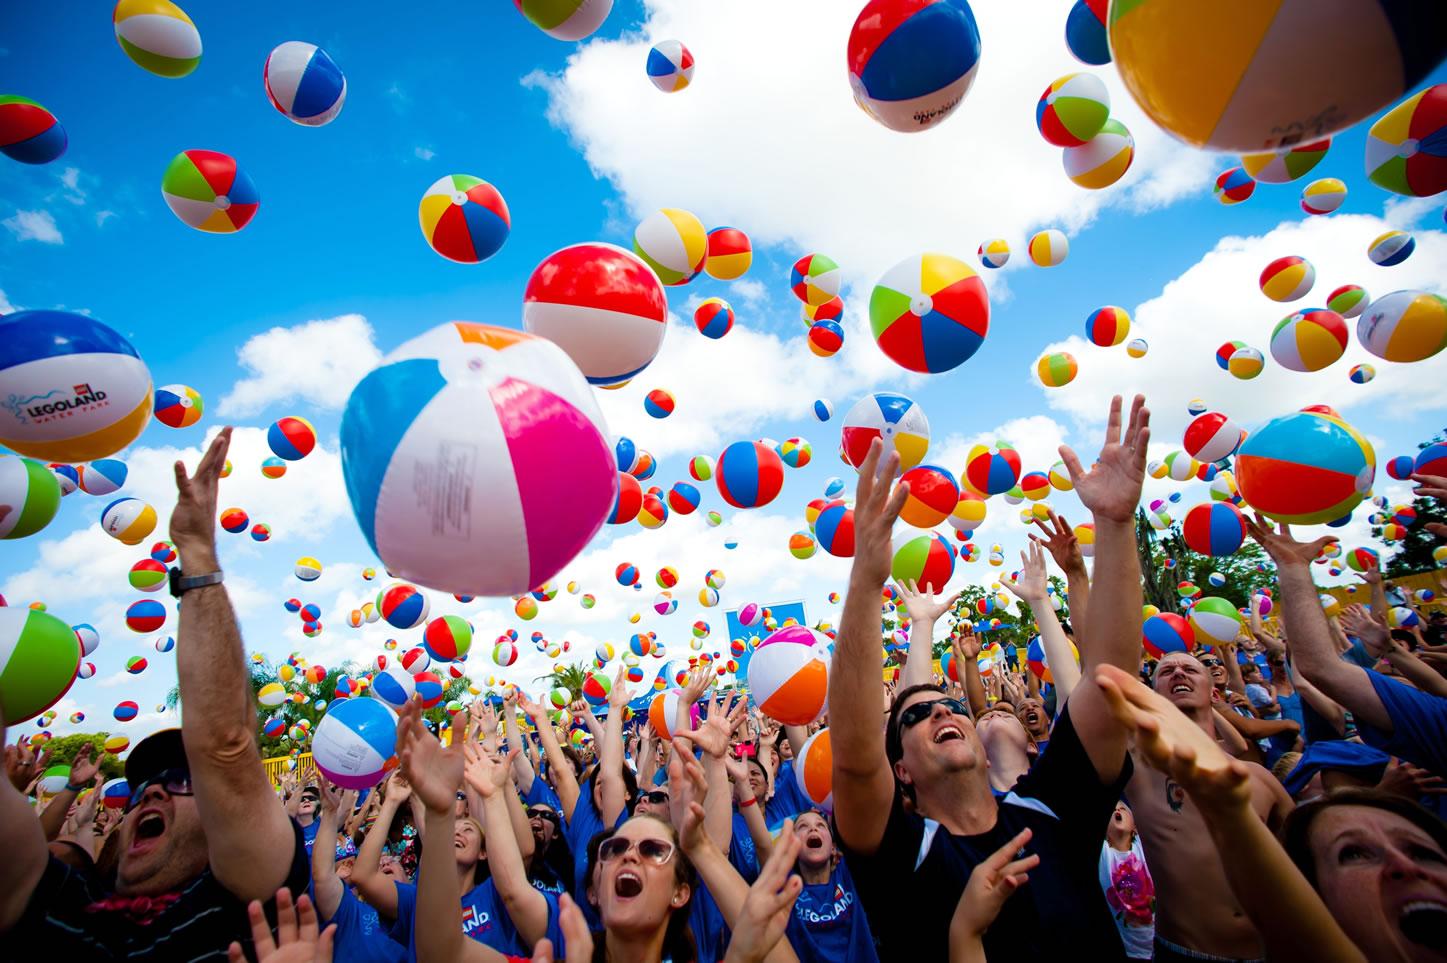 Promotional Inflatables | Beach Balls, Bang Bang Sticks ... |Many Beach Balls